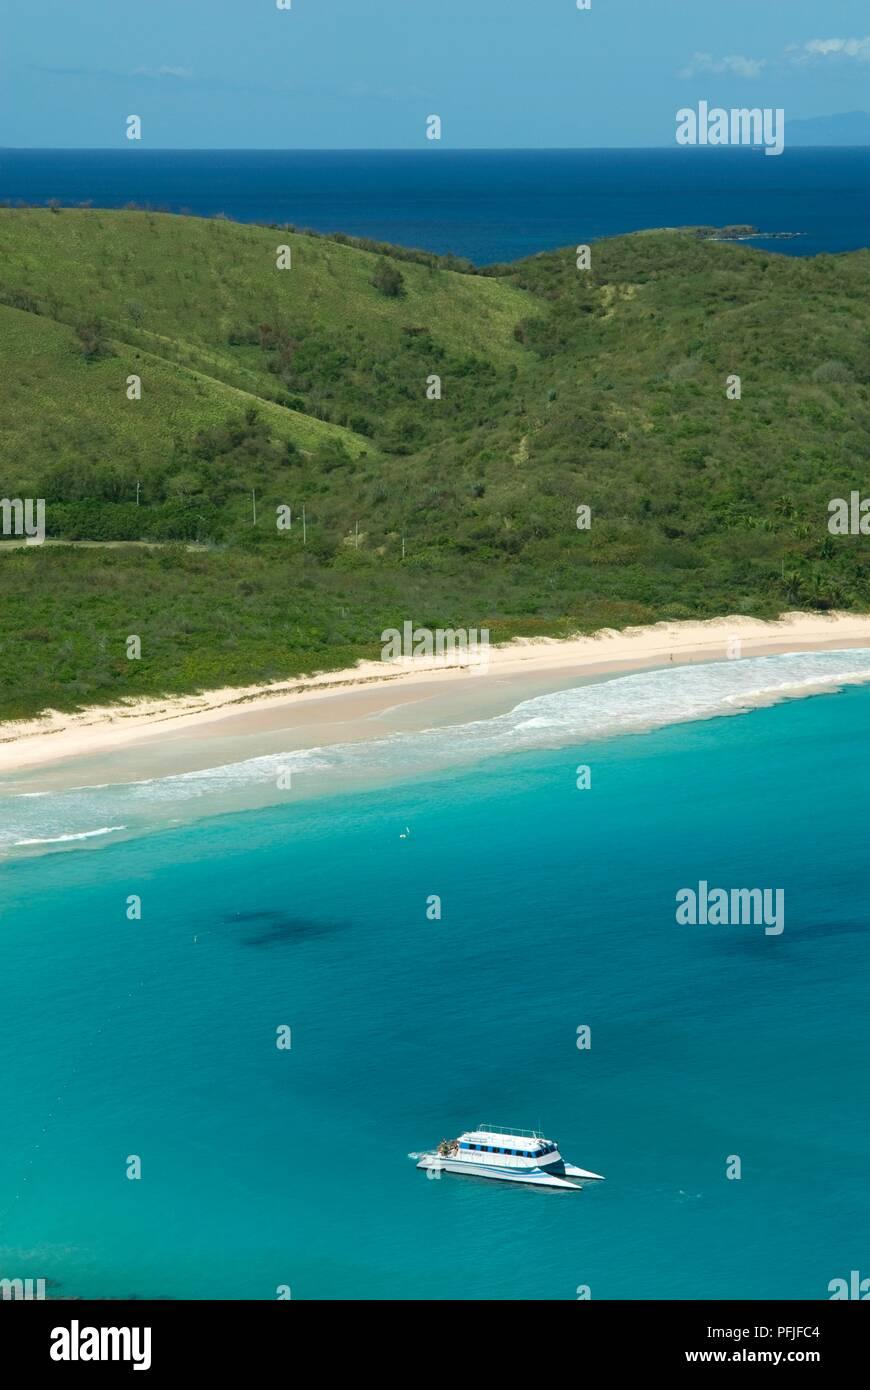 Puerto Rico Culebra Island Playa Flamenco View Of Green